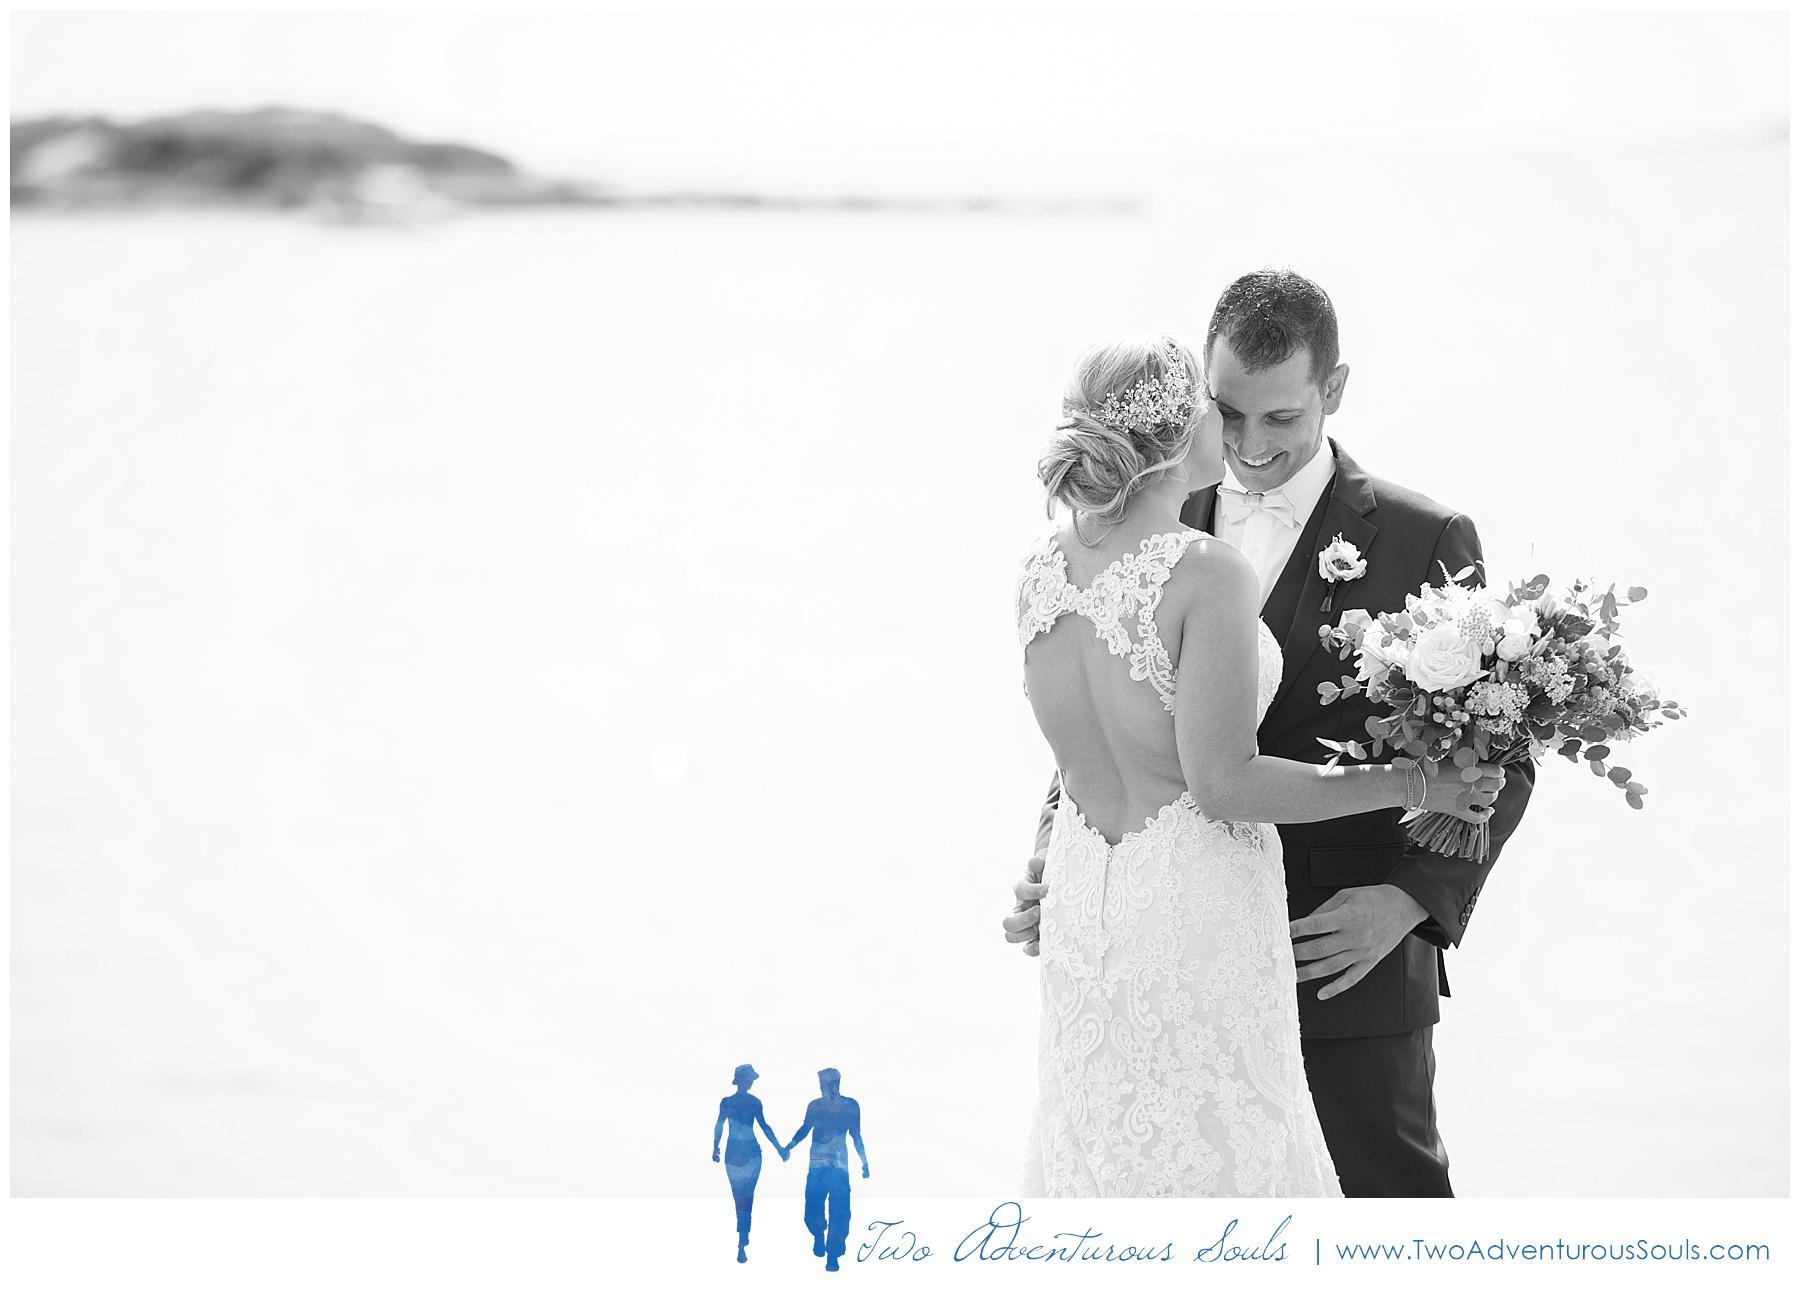 Connecticut Wedding Photographers, Lace Factory Wedding Photographers, Two Adventurous Souls - 083119_0022.jpg